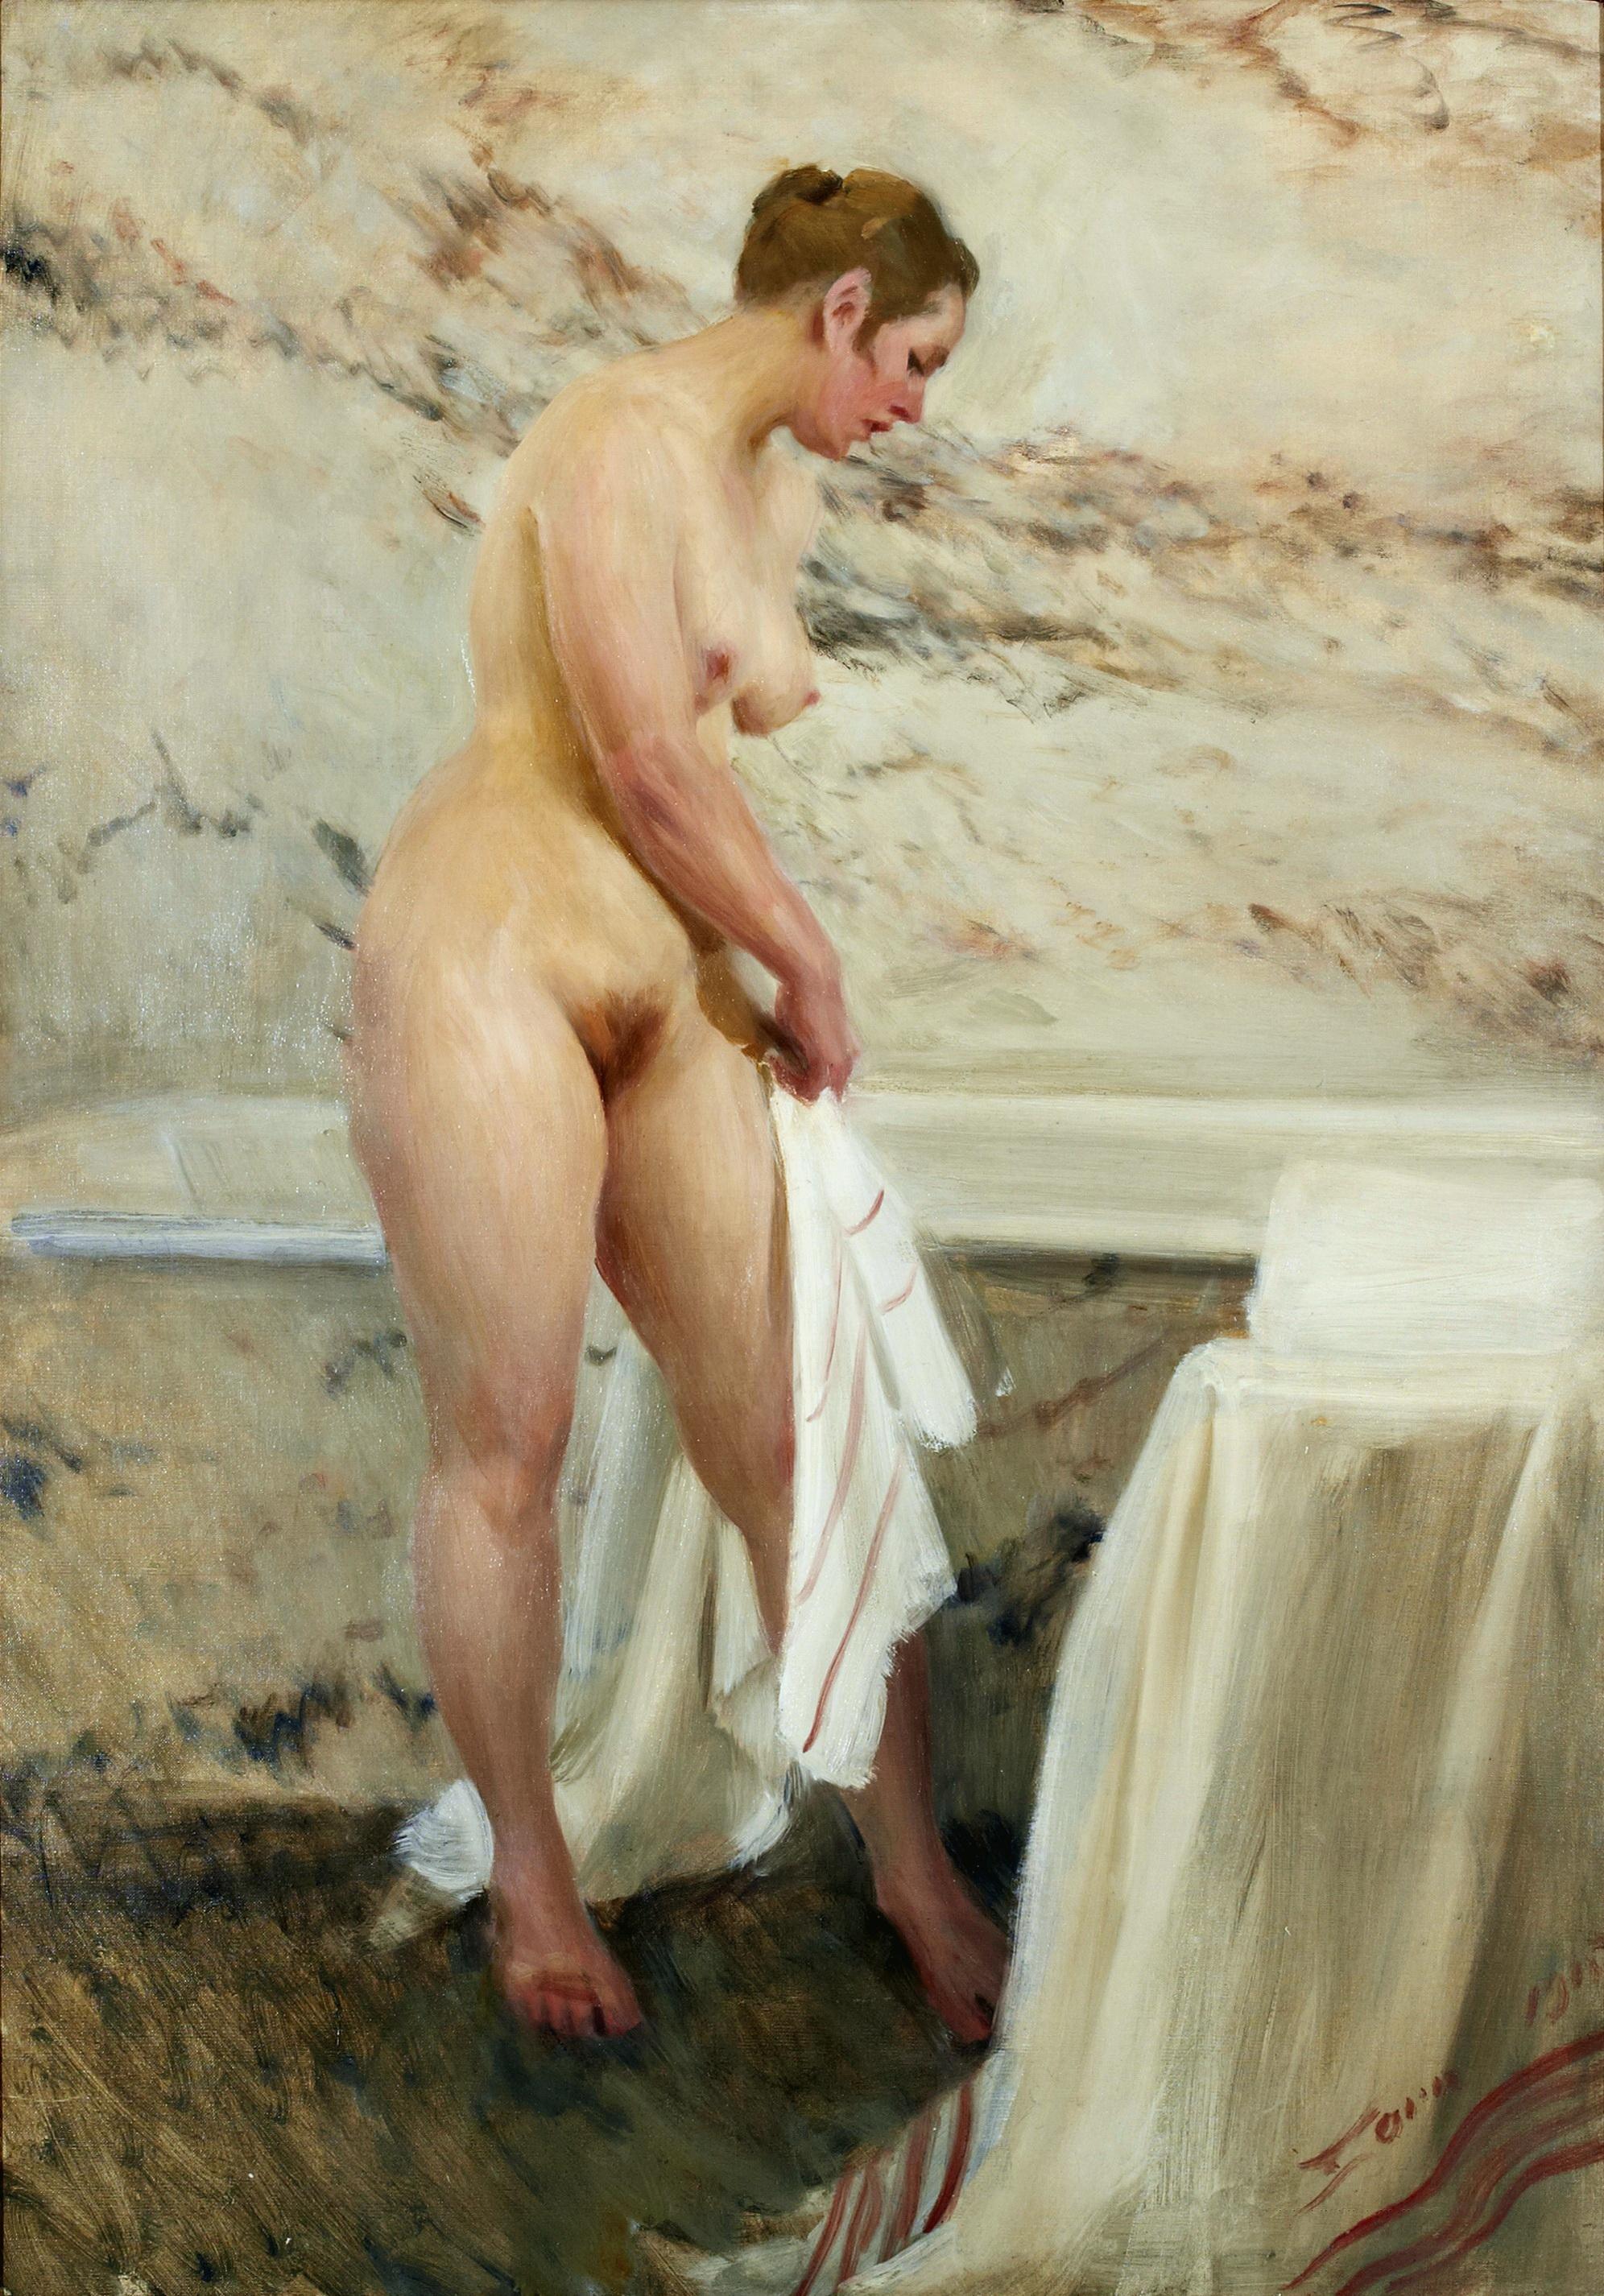 Anders Leonard Zorn. 1860-1920. В ванной комнате. 1915, 116 х 81 см. Частная коллекция